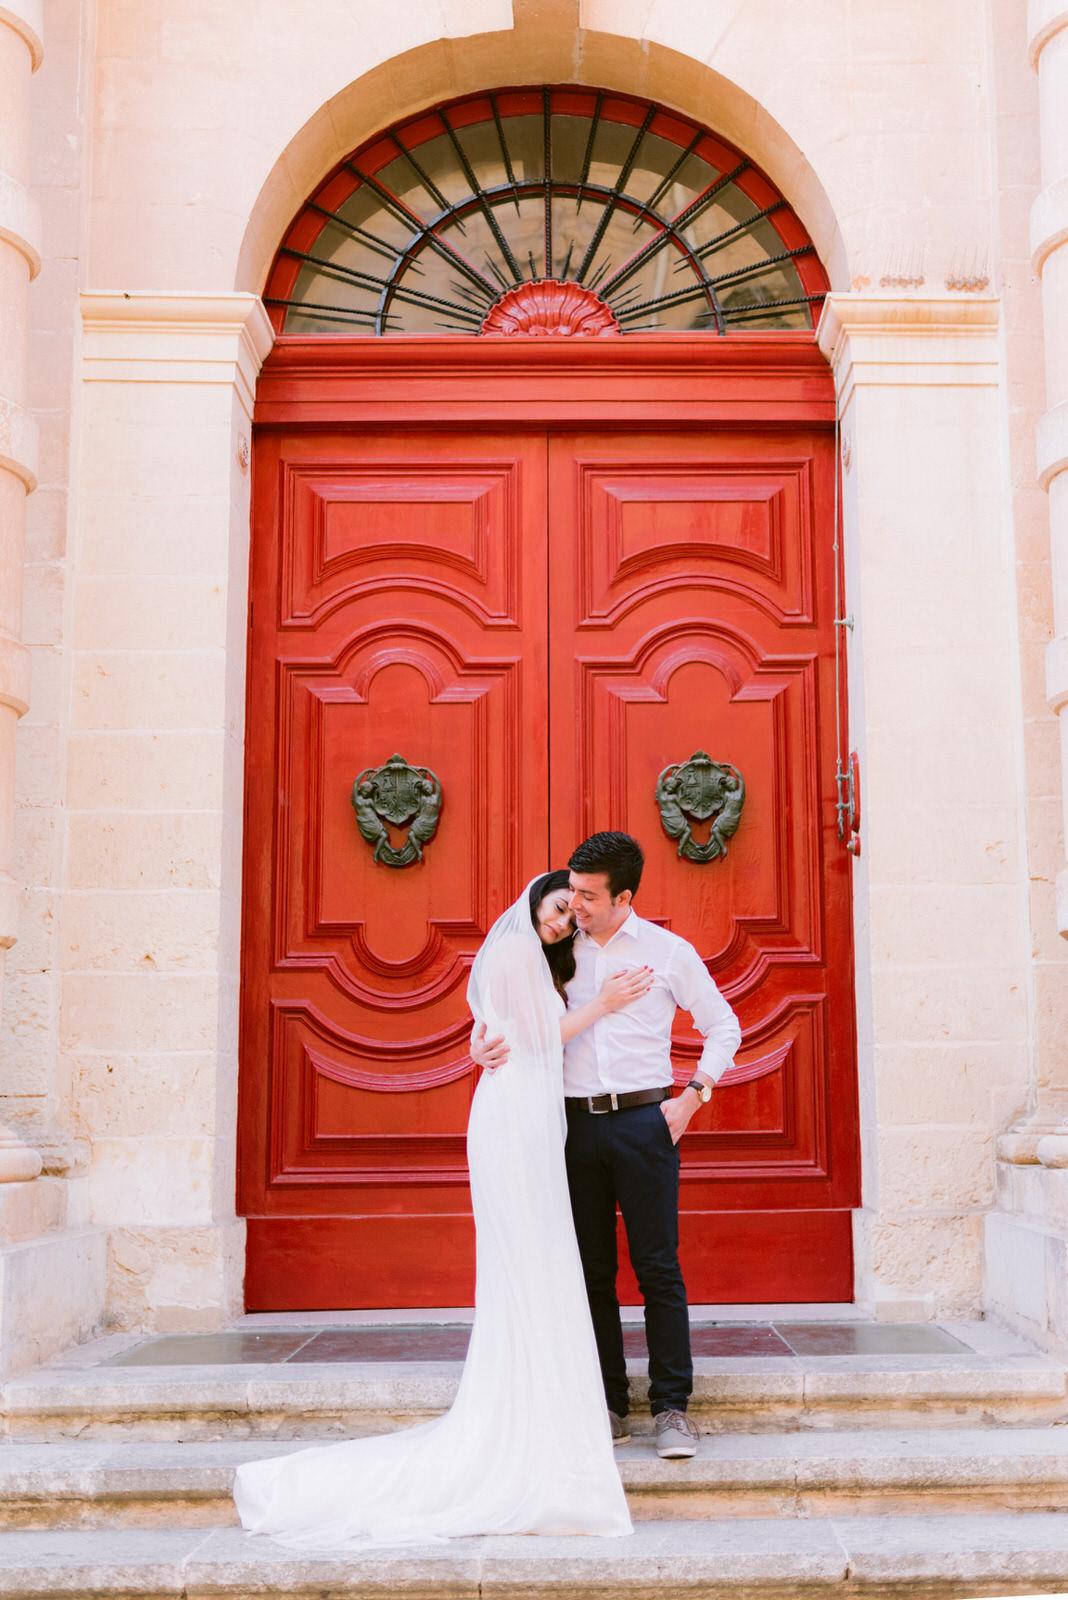 mdina wedding, malta wedding photography, malta elopement, golden bay malta wedding photos, wedding photographer malta, malta wedding venue, villa bologna wedding (19).jpg